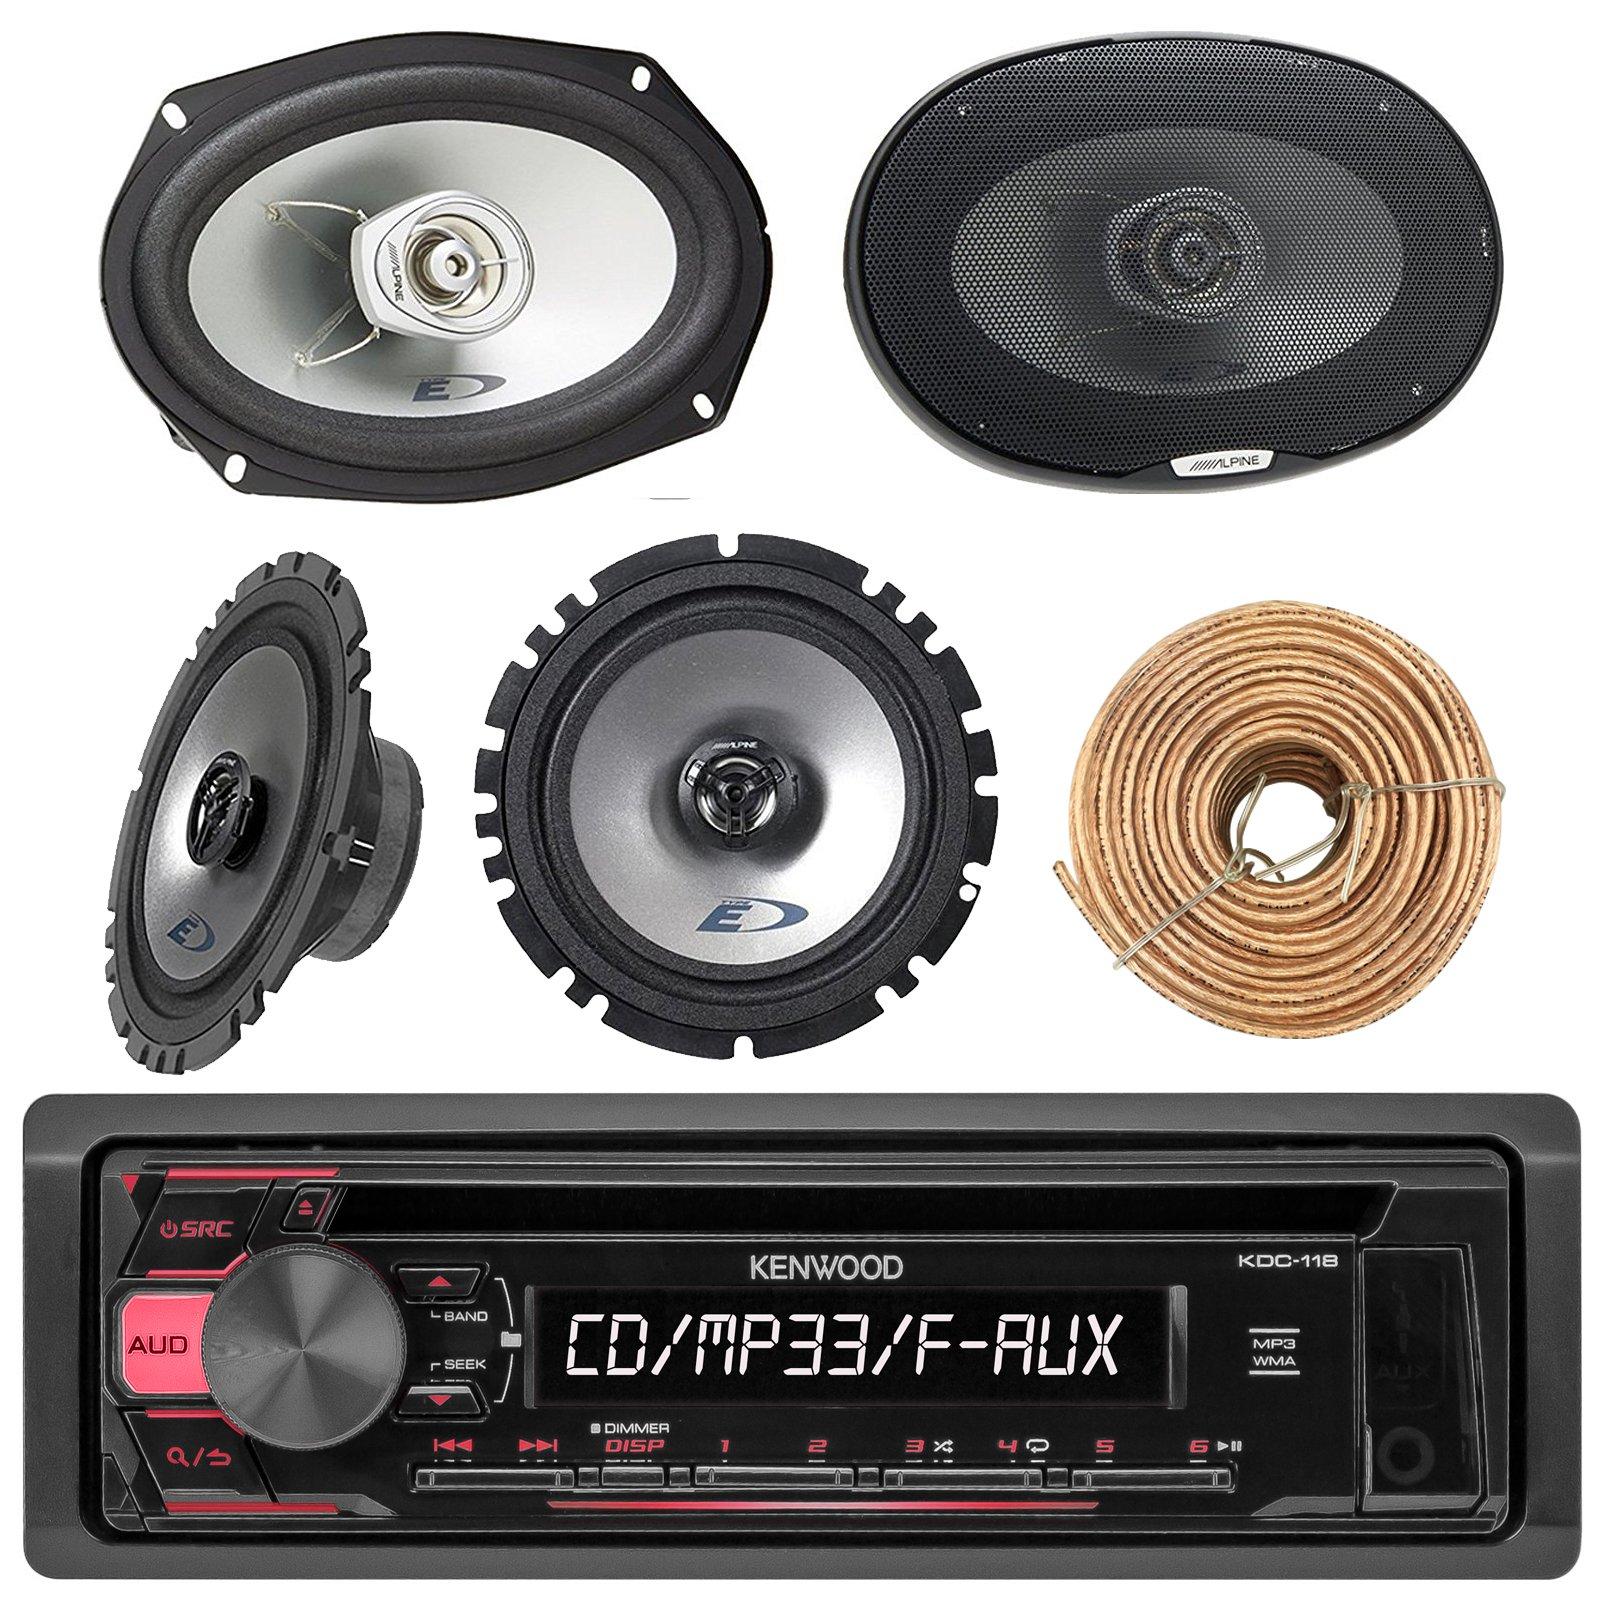 Kenwood KDC118 Car Radio AUX CD Player Receiver - Bundle Combo With 2x Alpine 6.5'' 80W 2-Way Coaxial Car Speakers + 2x 6x9 Inch 280W Black Speaker + Enrock 50 Ft 18G Speaker Wire by EnrockAudioBundle (Image #1)